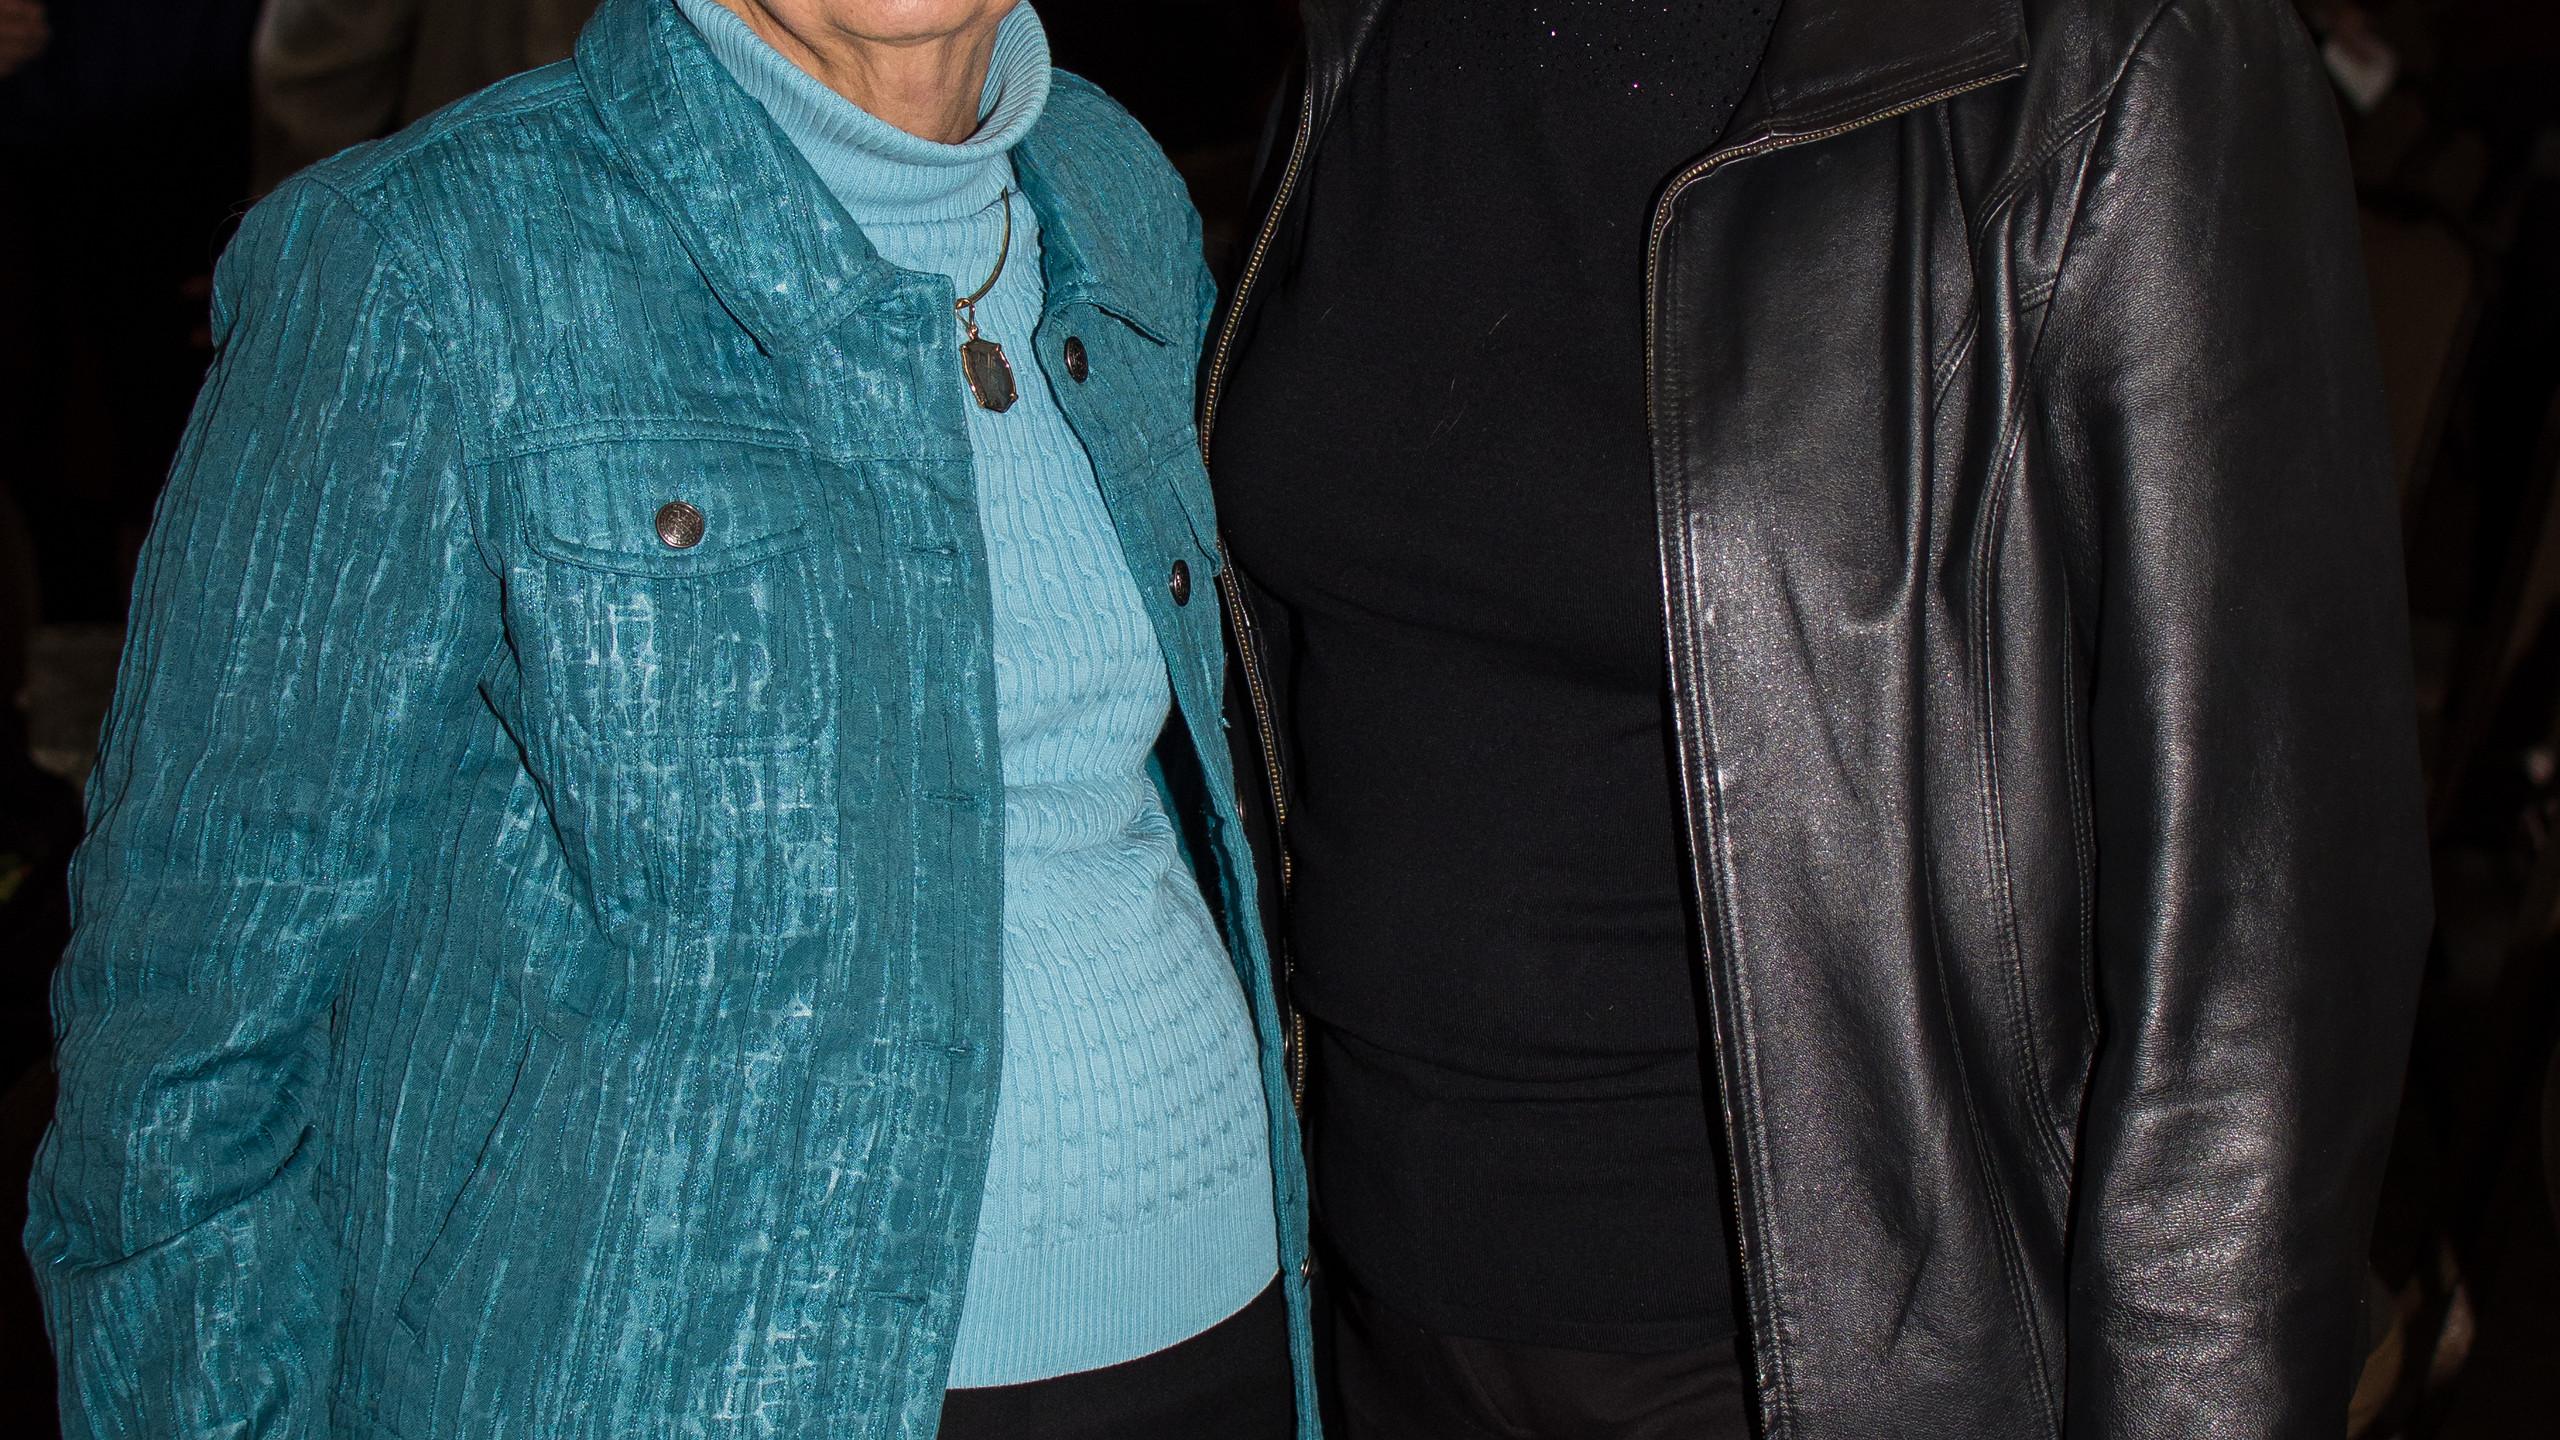 Dottie Mann and Karen Sorenson